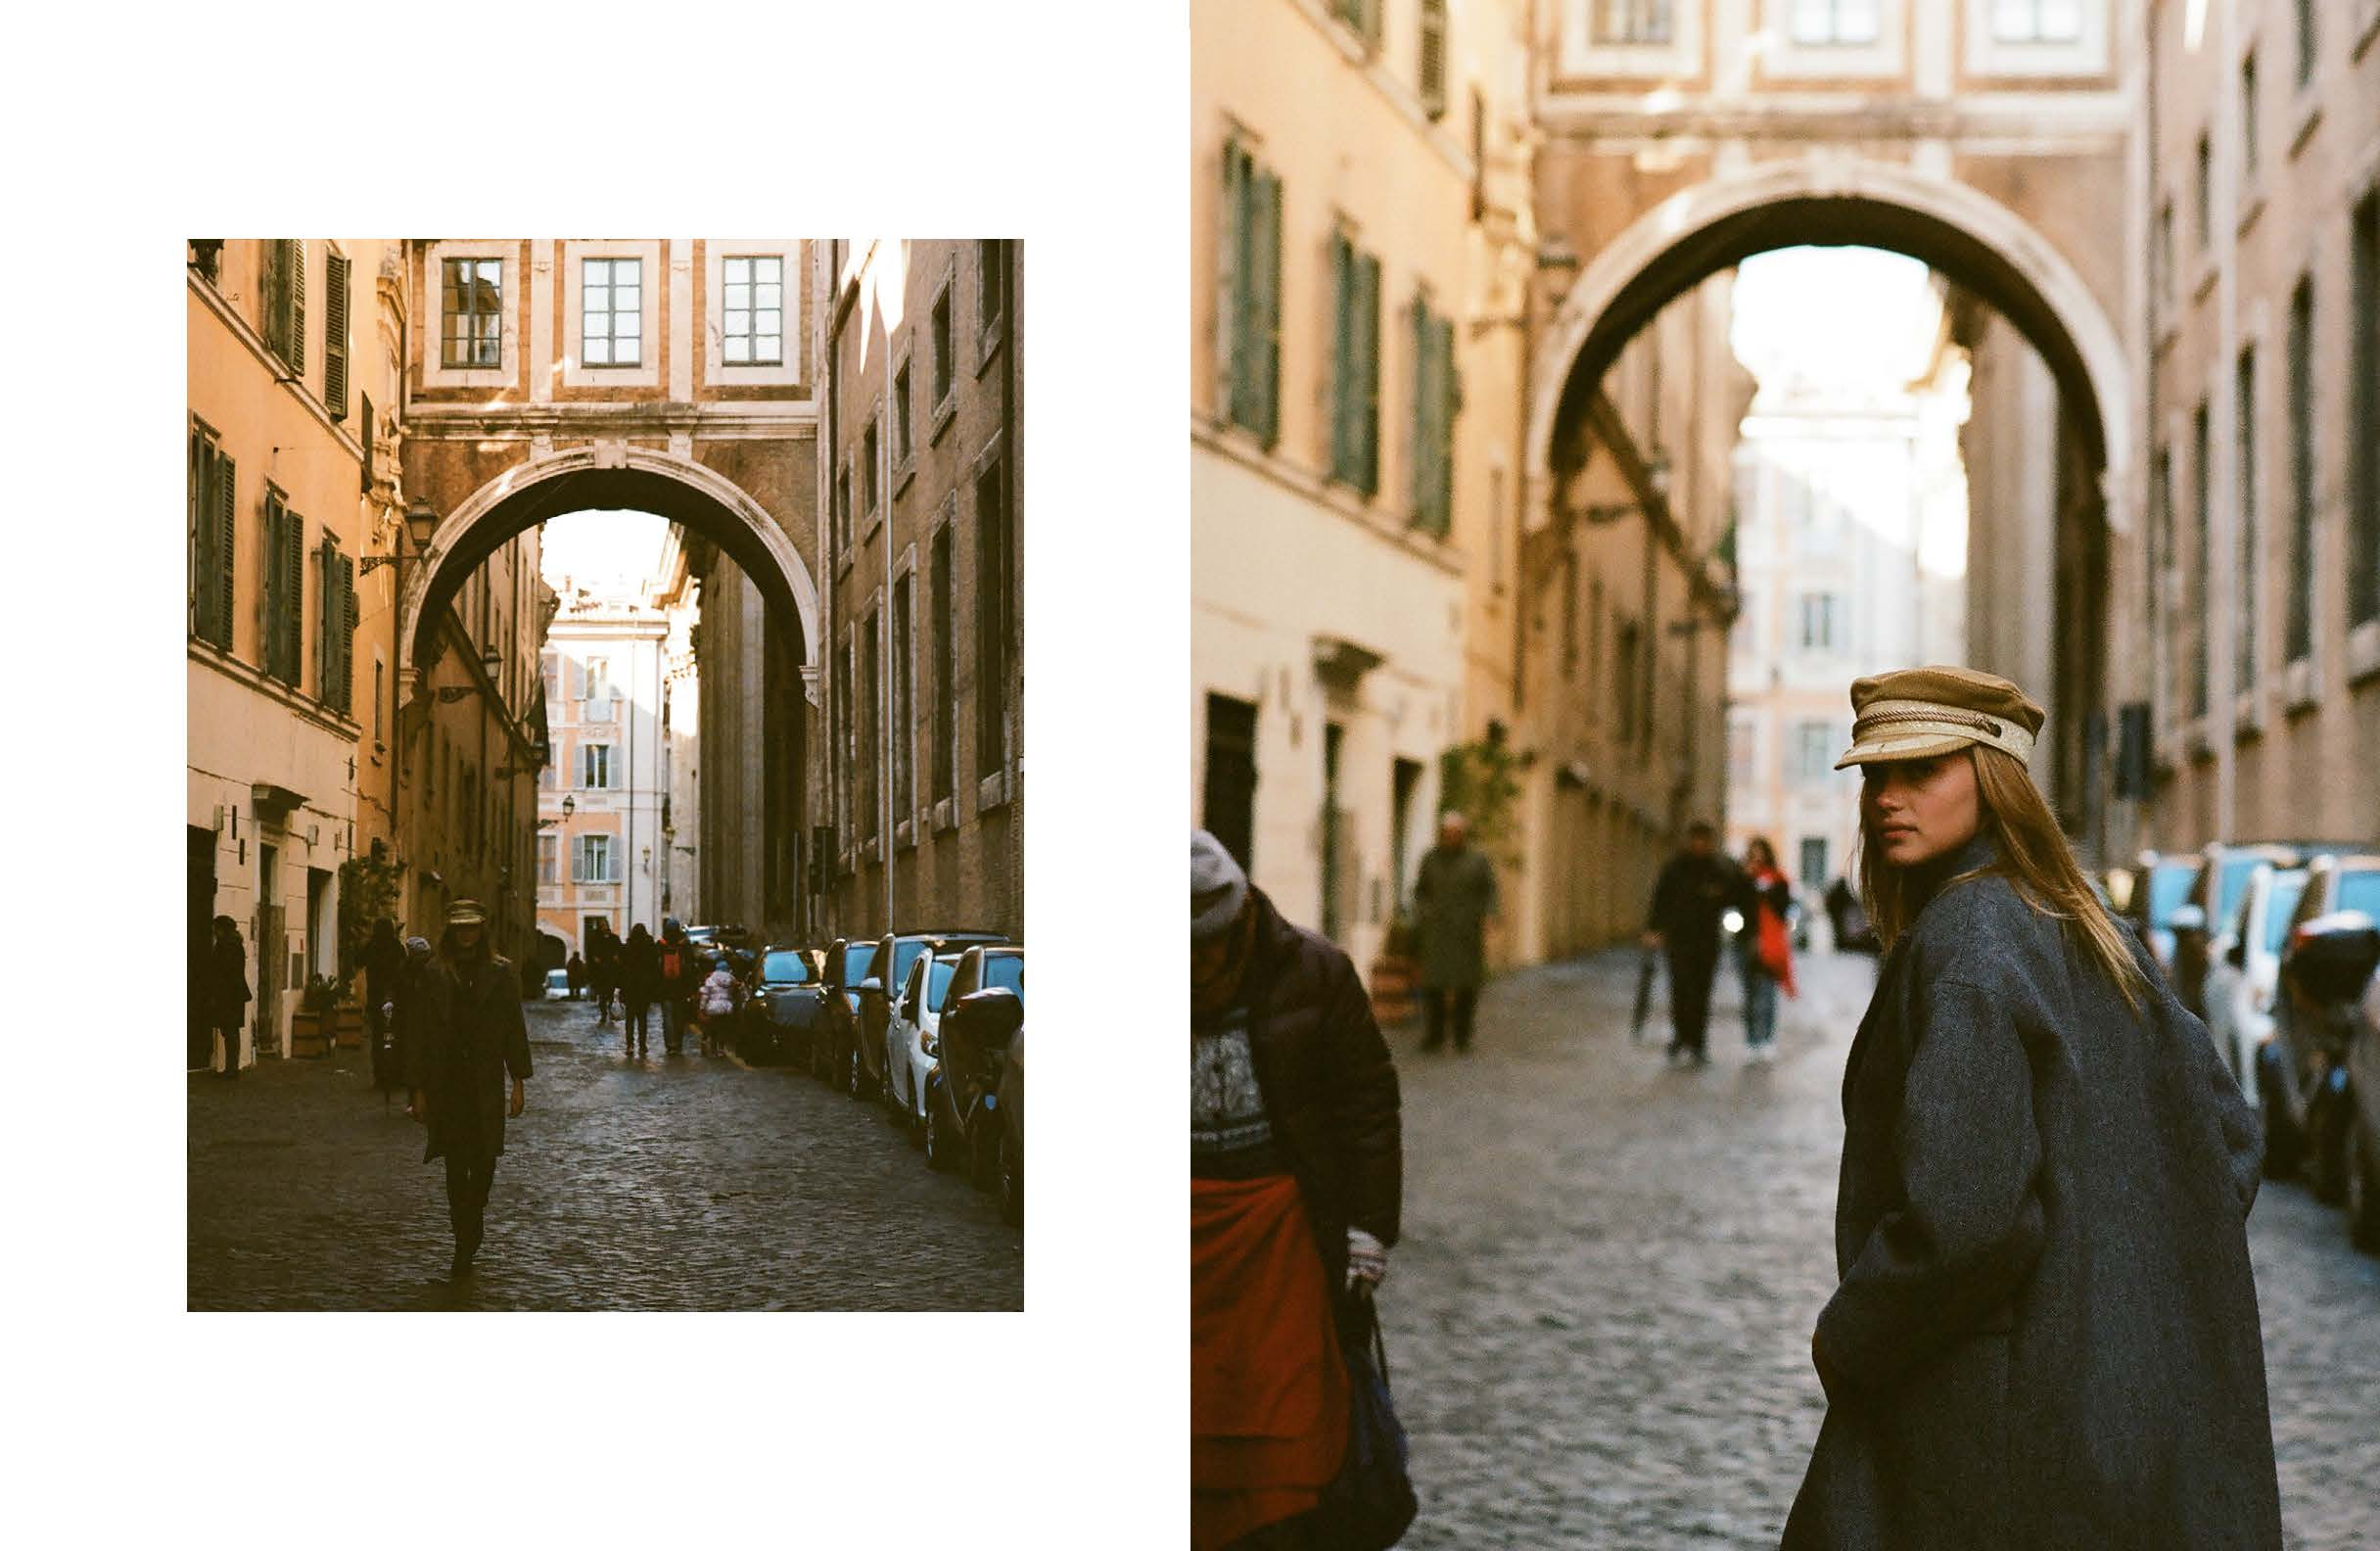 London To Rome - Brixton_Page_03.jpg